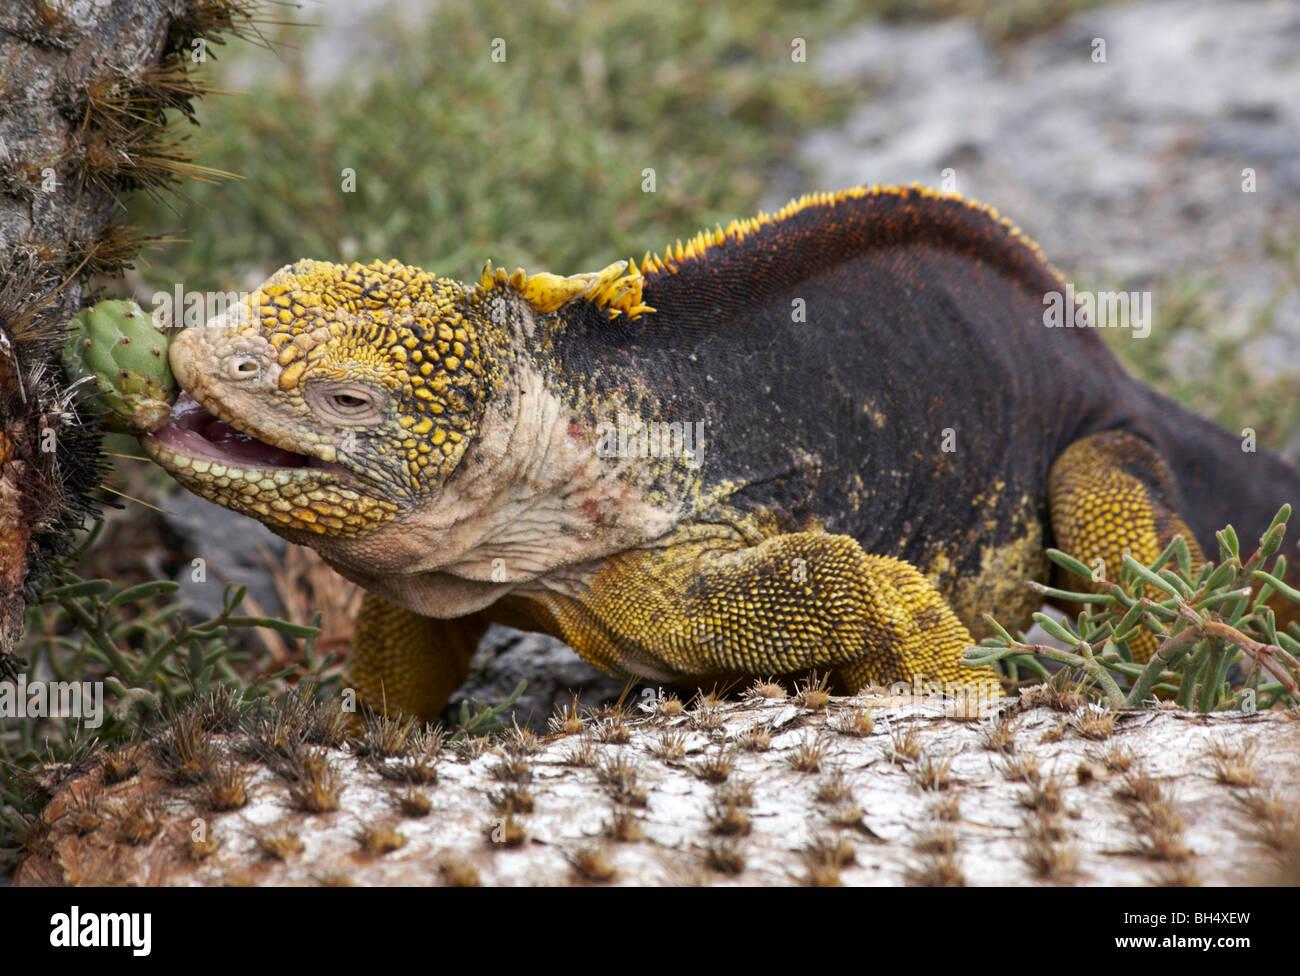 Iguanas terrestres (Conolophus subcristatus) lánguida gigante nopal (Opuntia echios var echios spp) Foto de stock